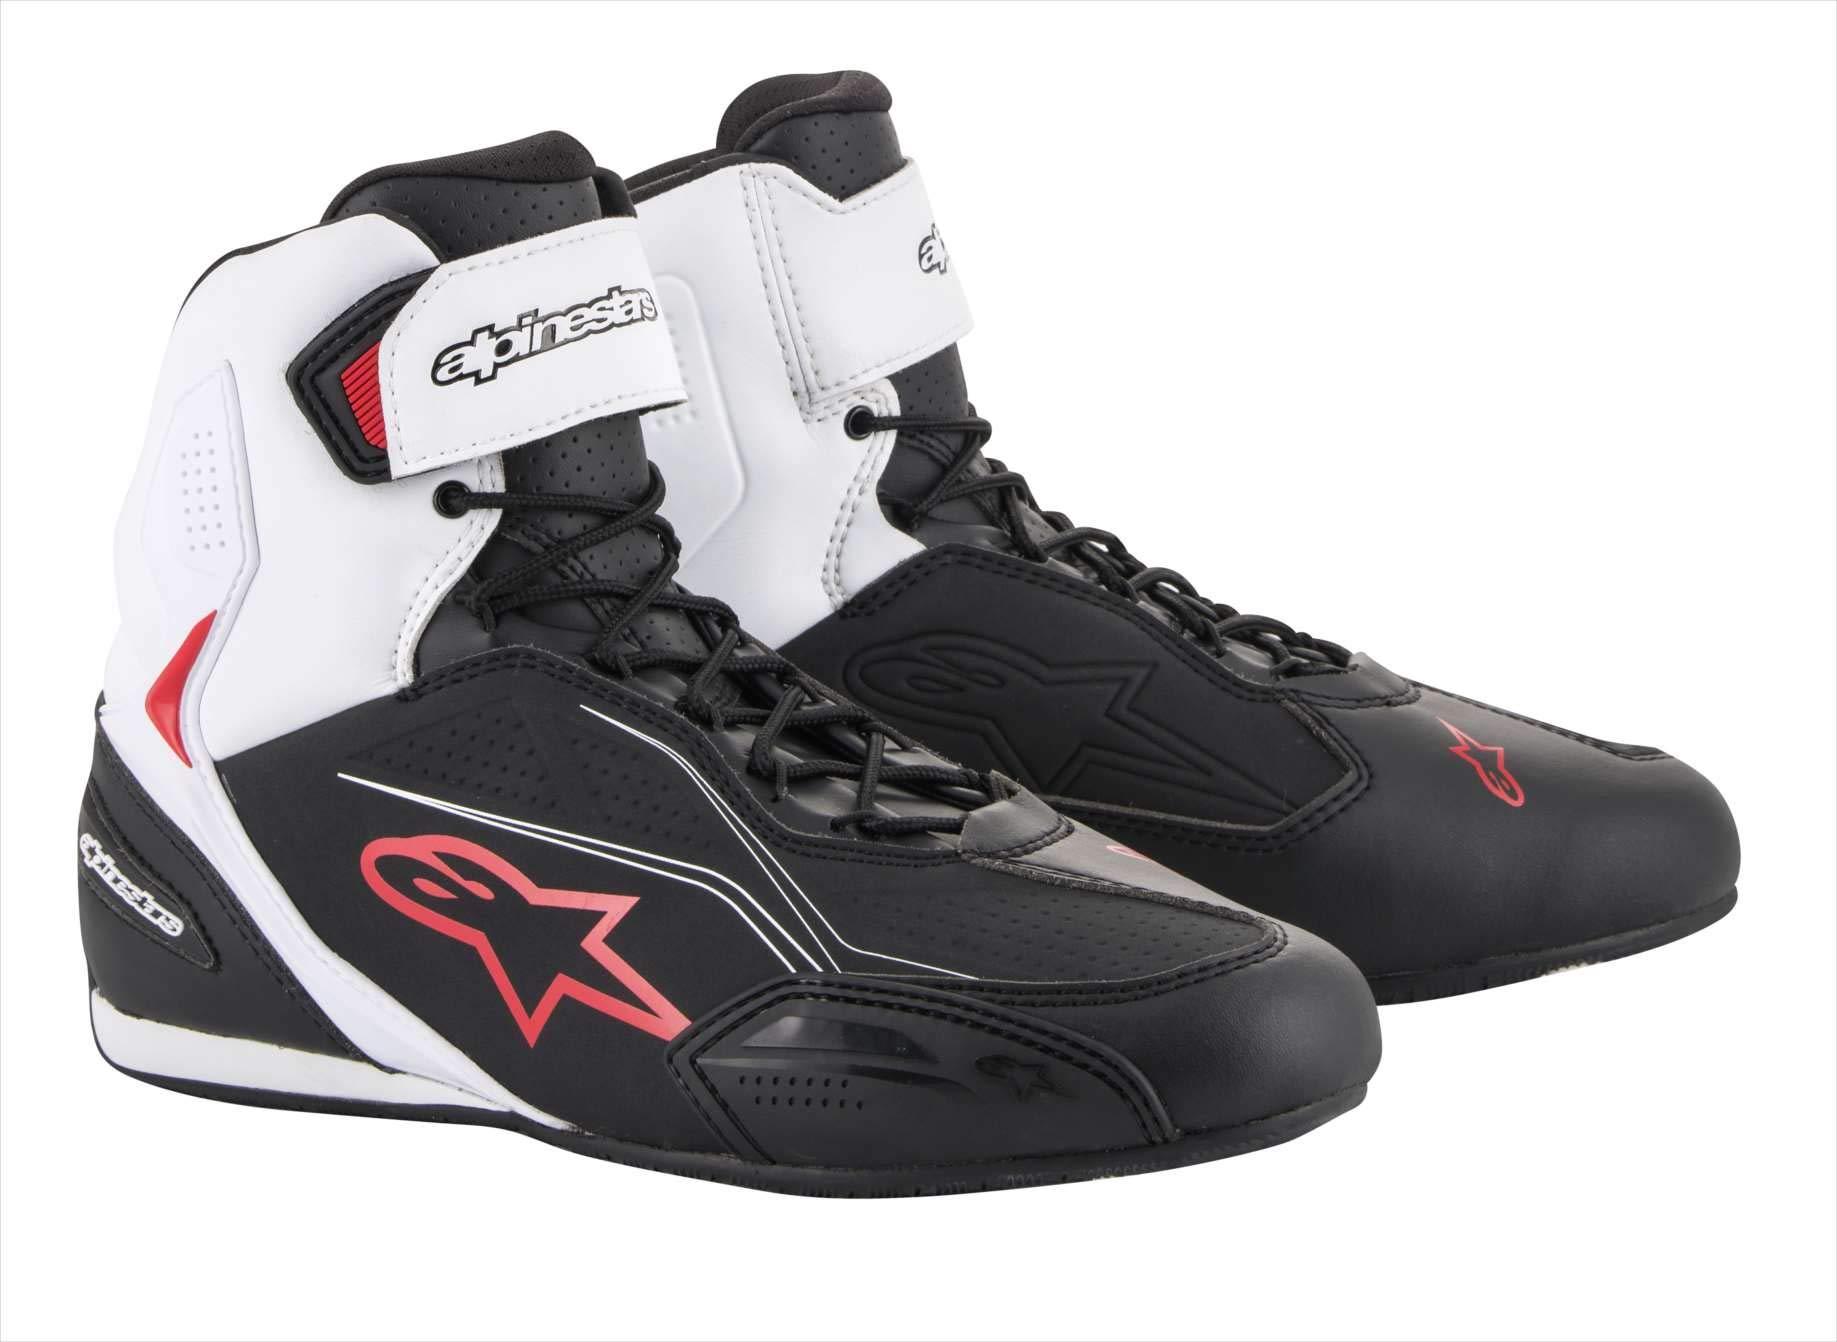 Alpinestars Faster-3 Shoes (8.5, Black/White/Red)